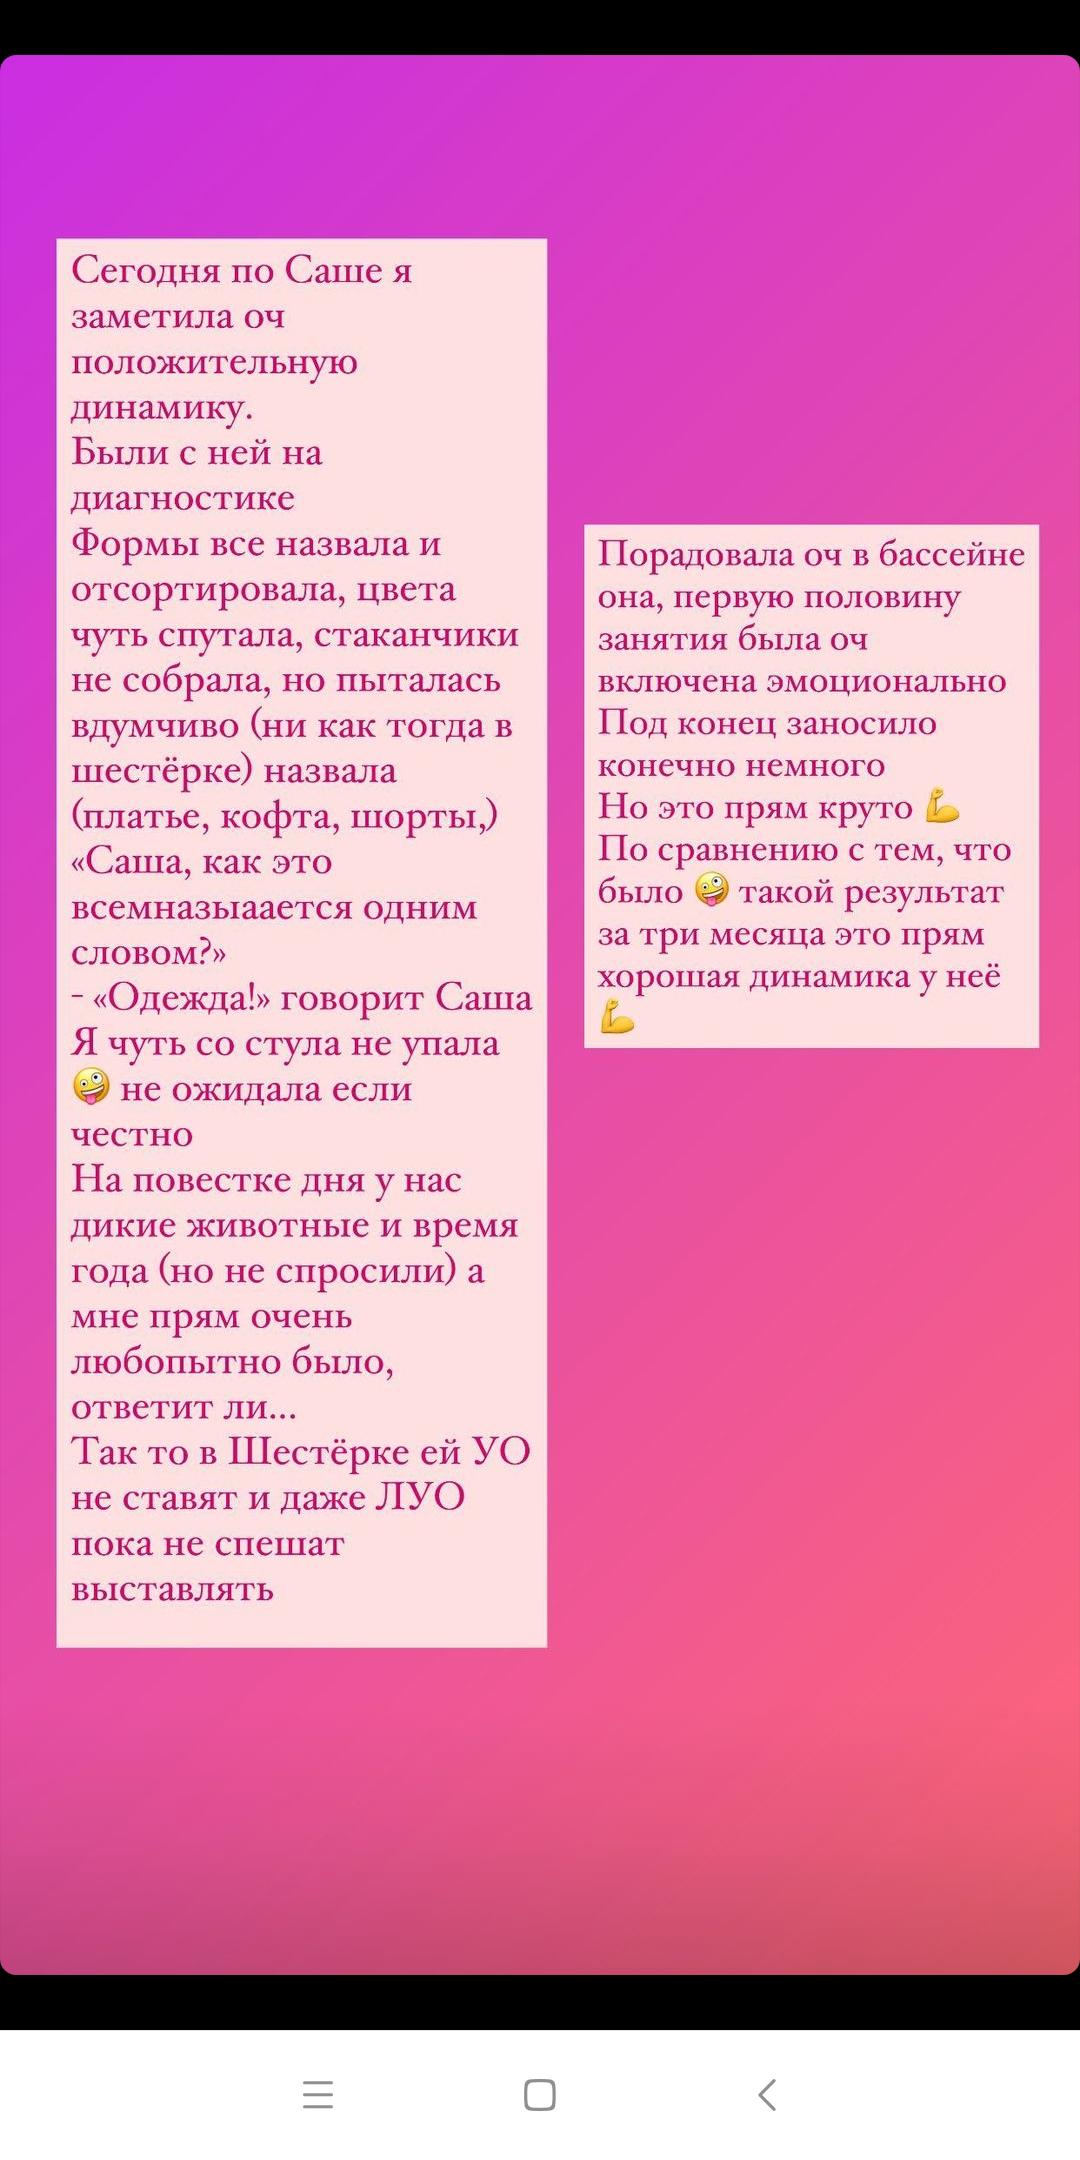 Screenshot_2021-01-14-07-08-17-770_com.instagram.android.png